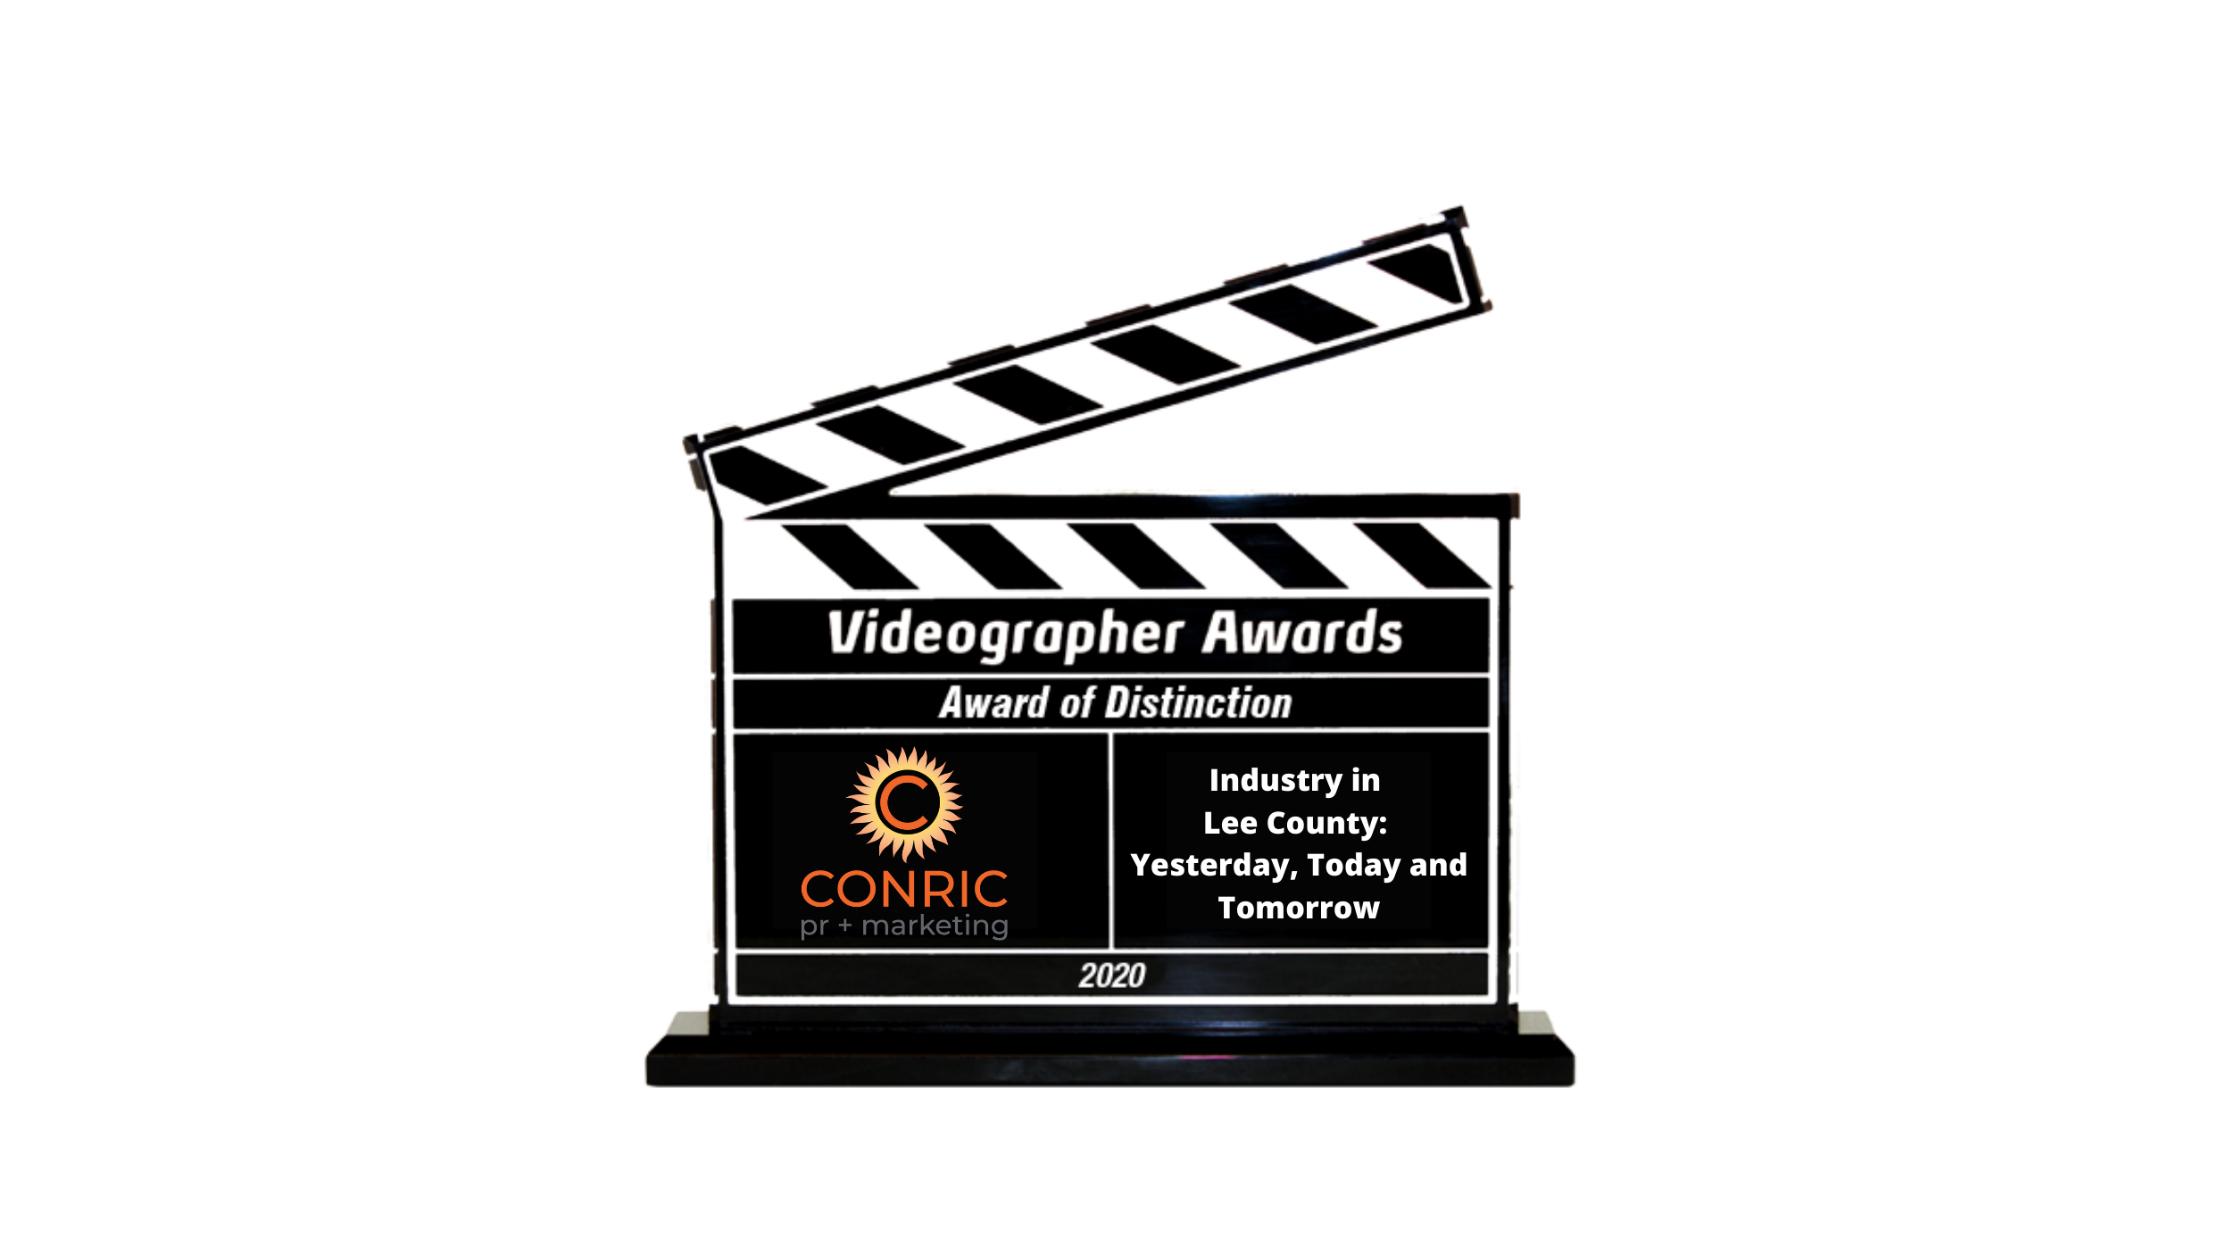 CONRIC pr + marketing earns international Videographer Awards Award of Distinction